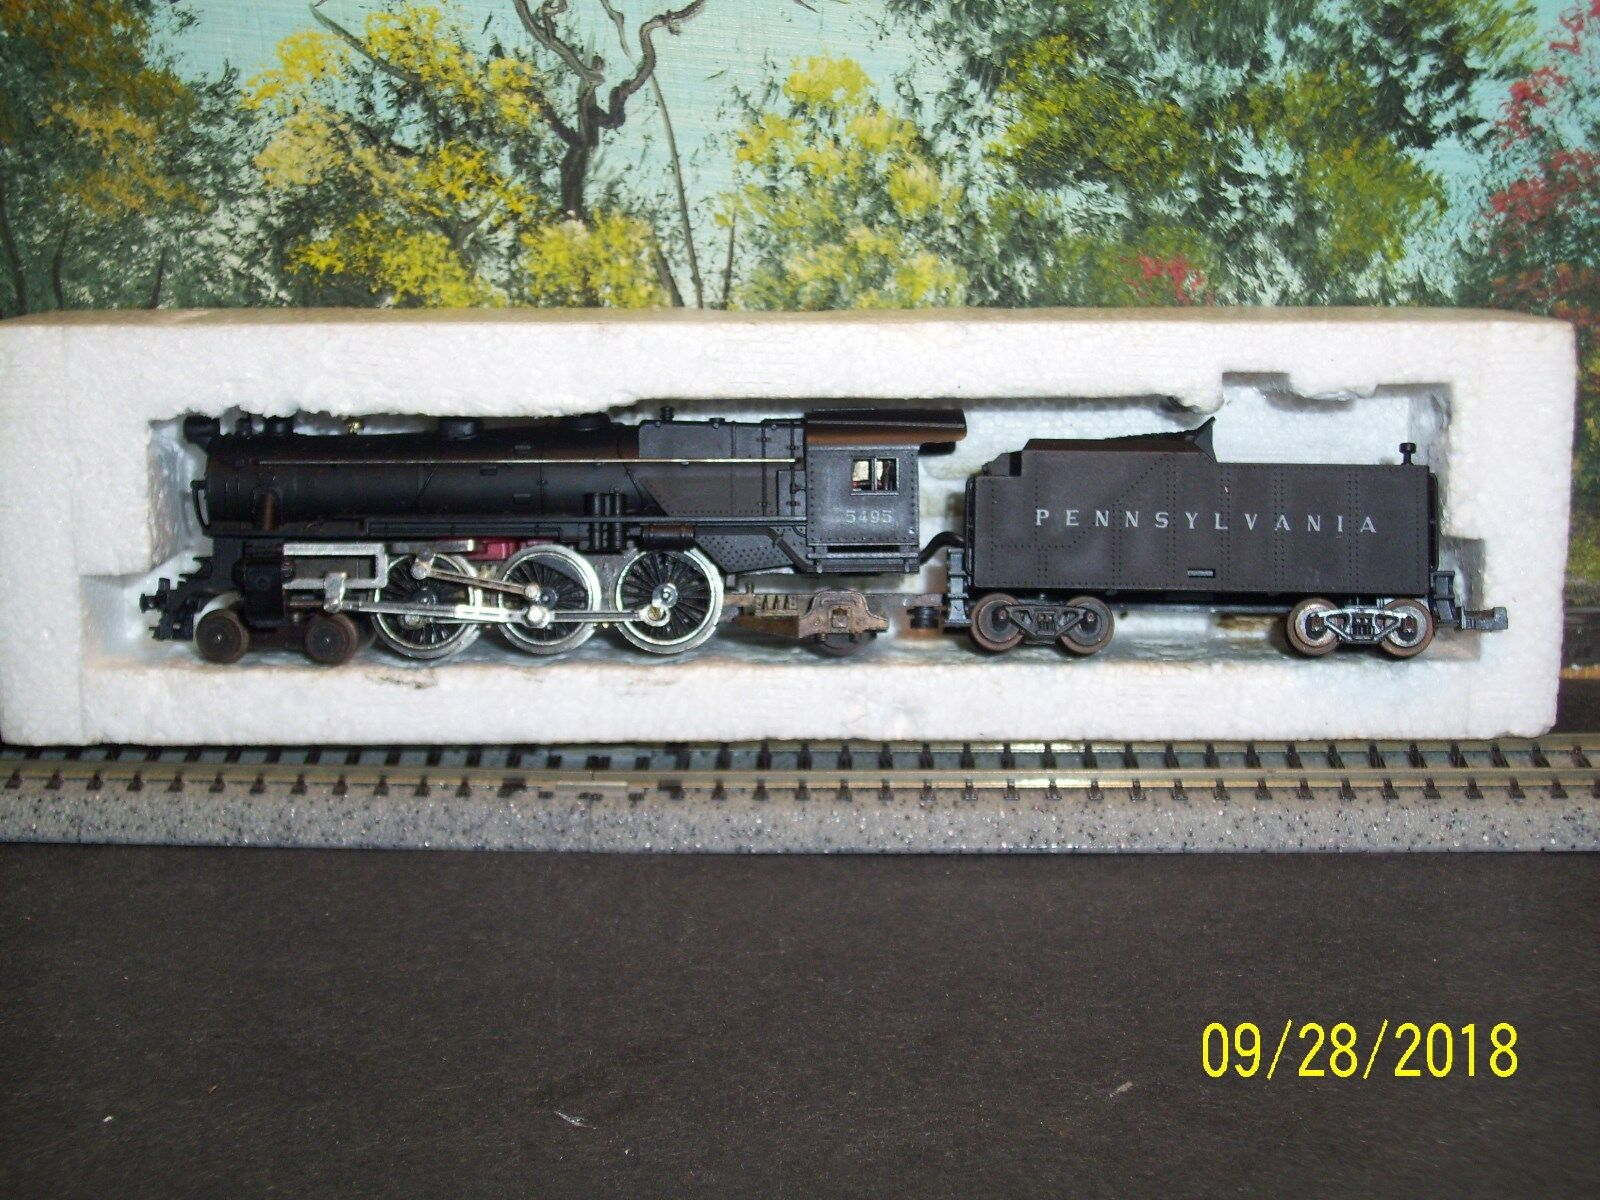 Minitrix Escala N  51 2970 00 4-6-2 Locomotora Pennsylvania Railroad  5495